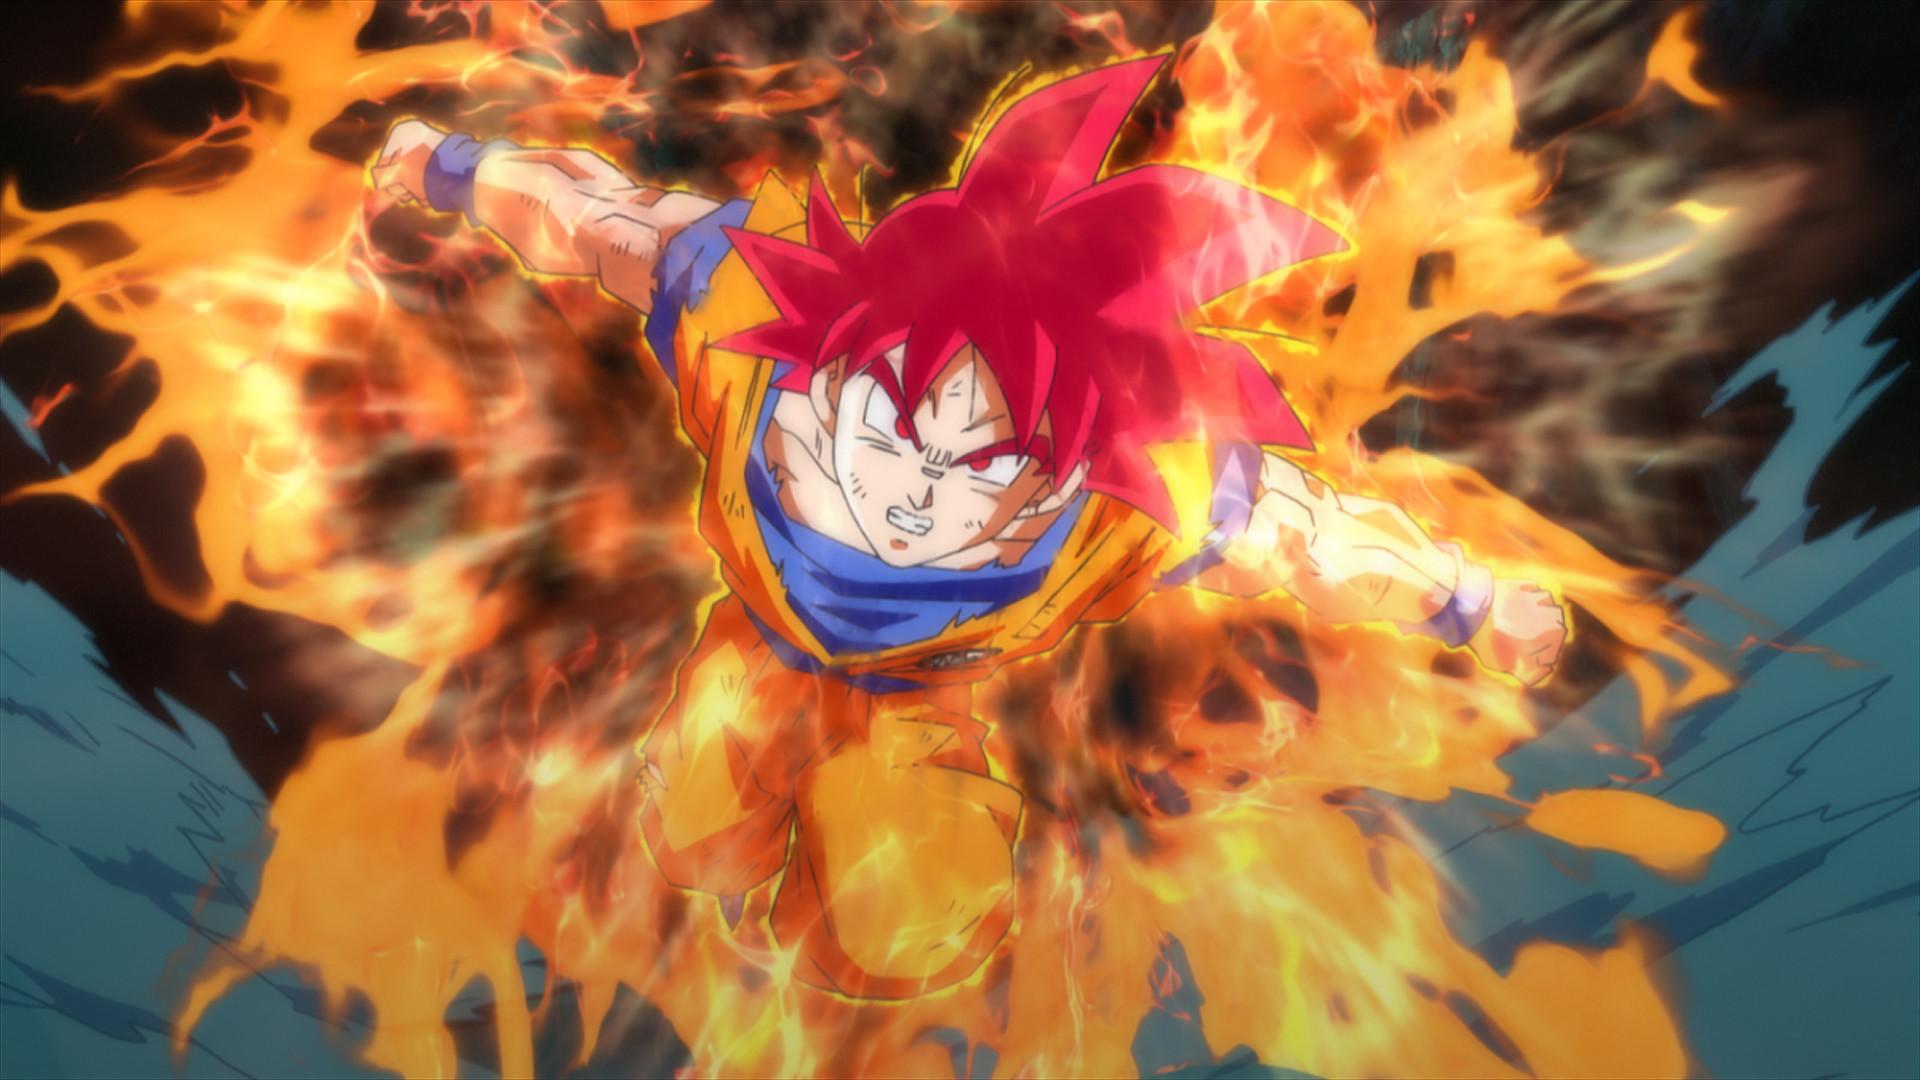 Bleach Wallpapers Hd 1080p Dragon Ball Z Battle Of Gods The Nostalgia Spot